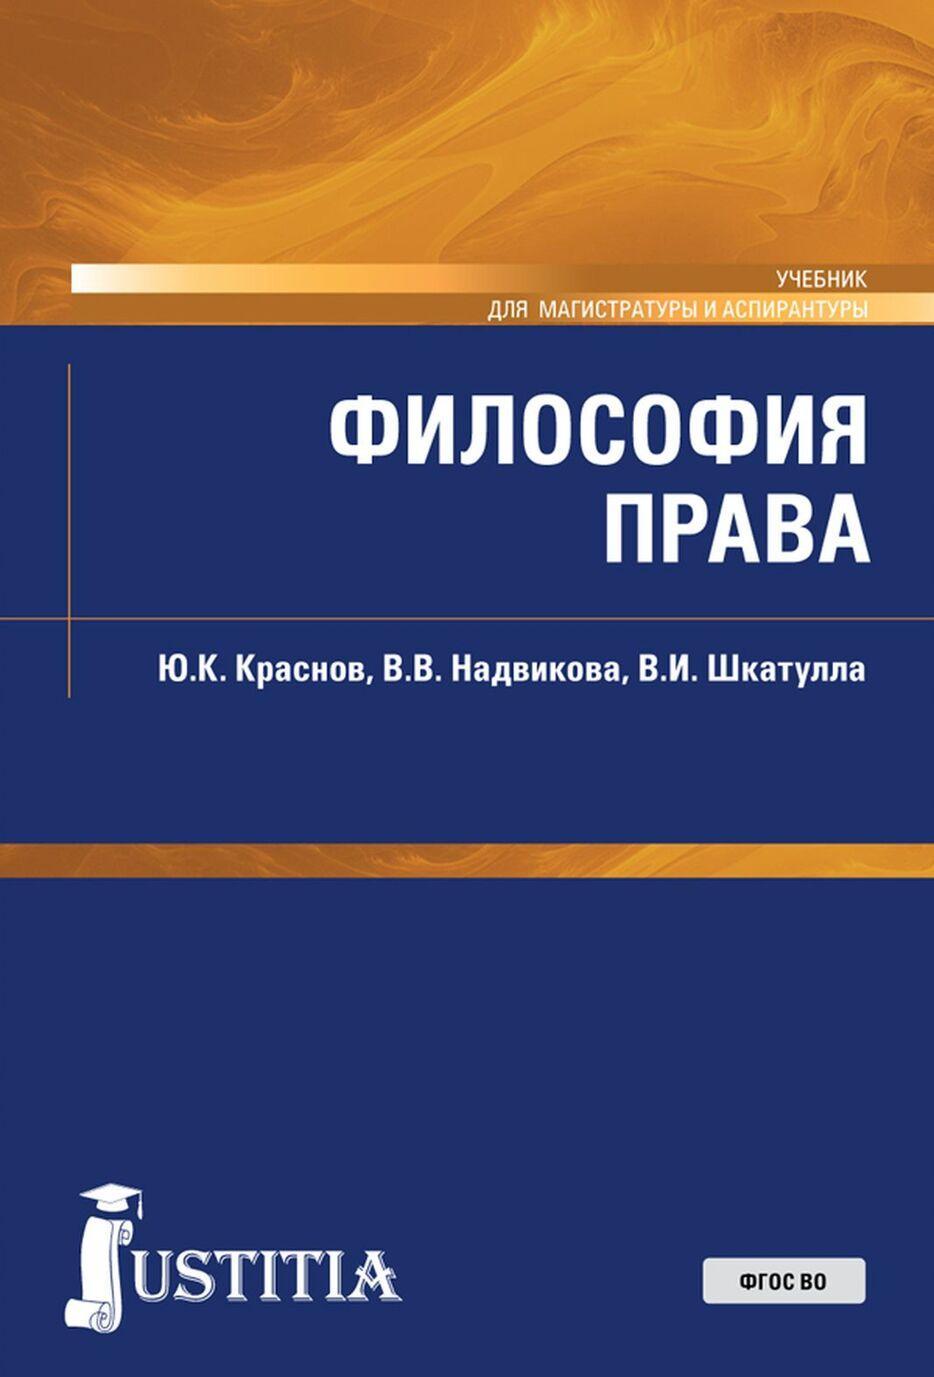 Filosofija prava. Uchebnik | Krasnov Jurij Konstantinovich, Nadvikova Valentina Vasilevna